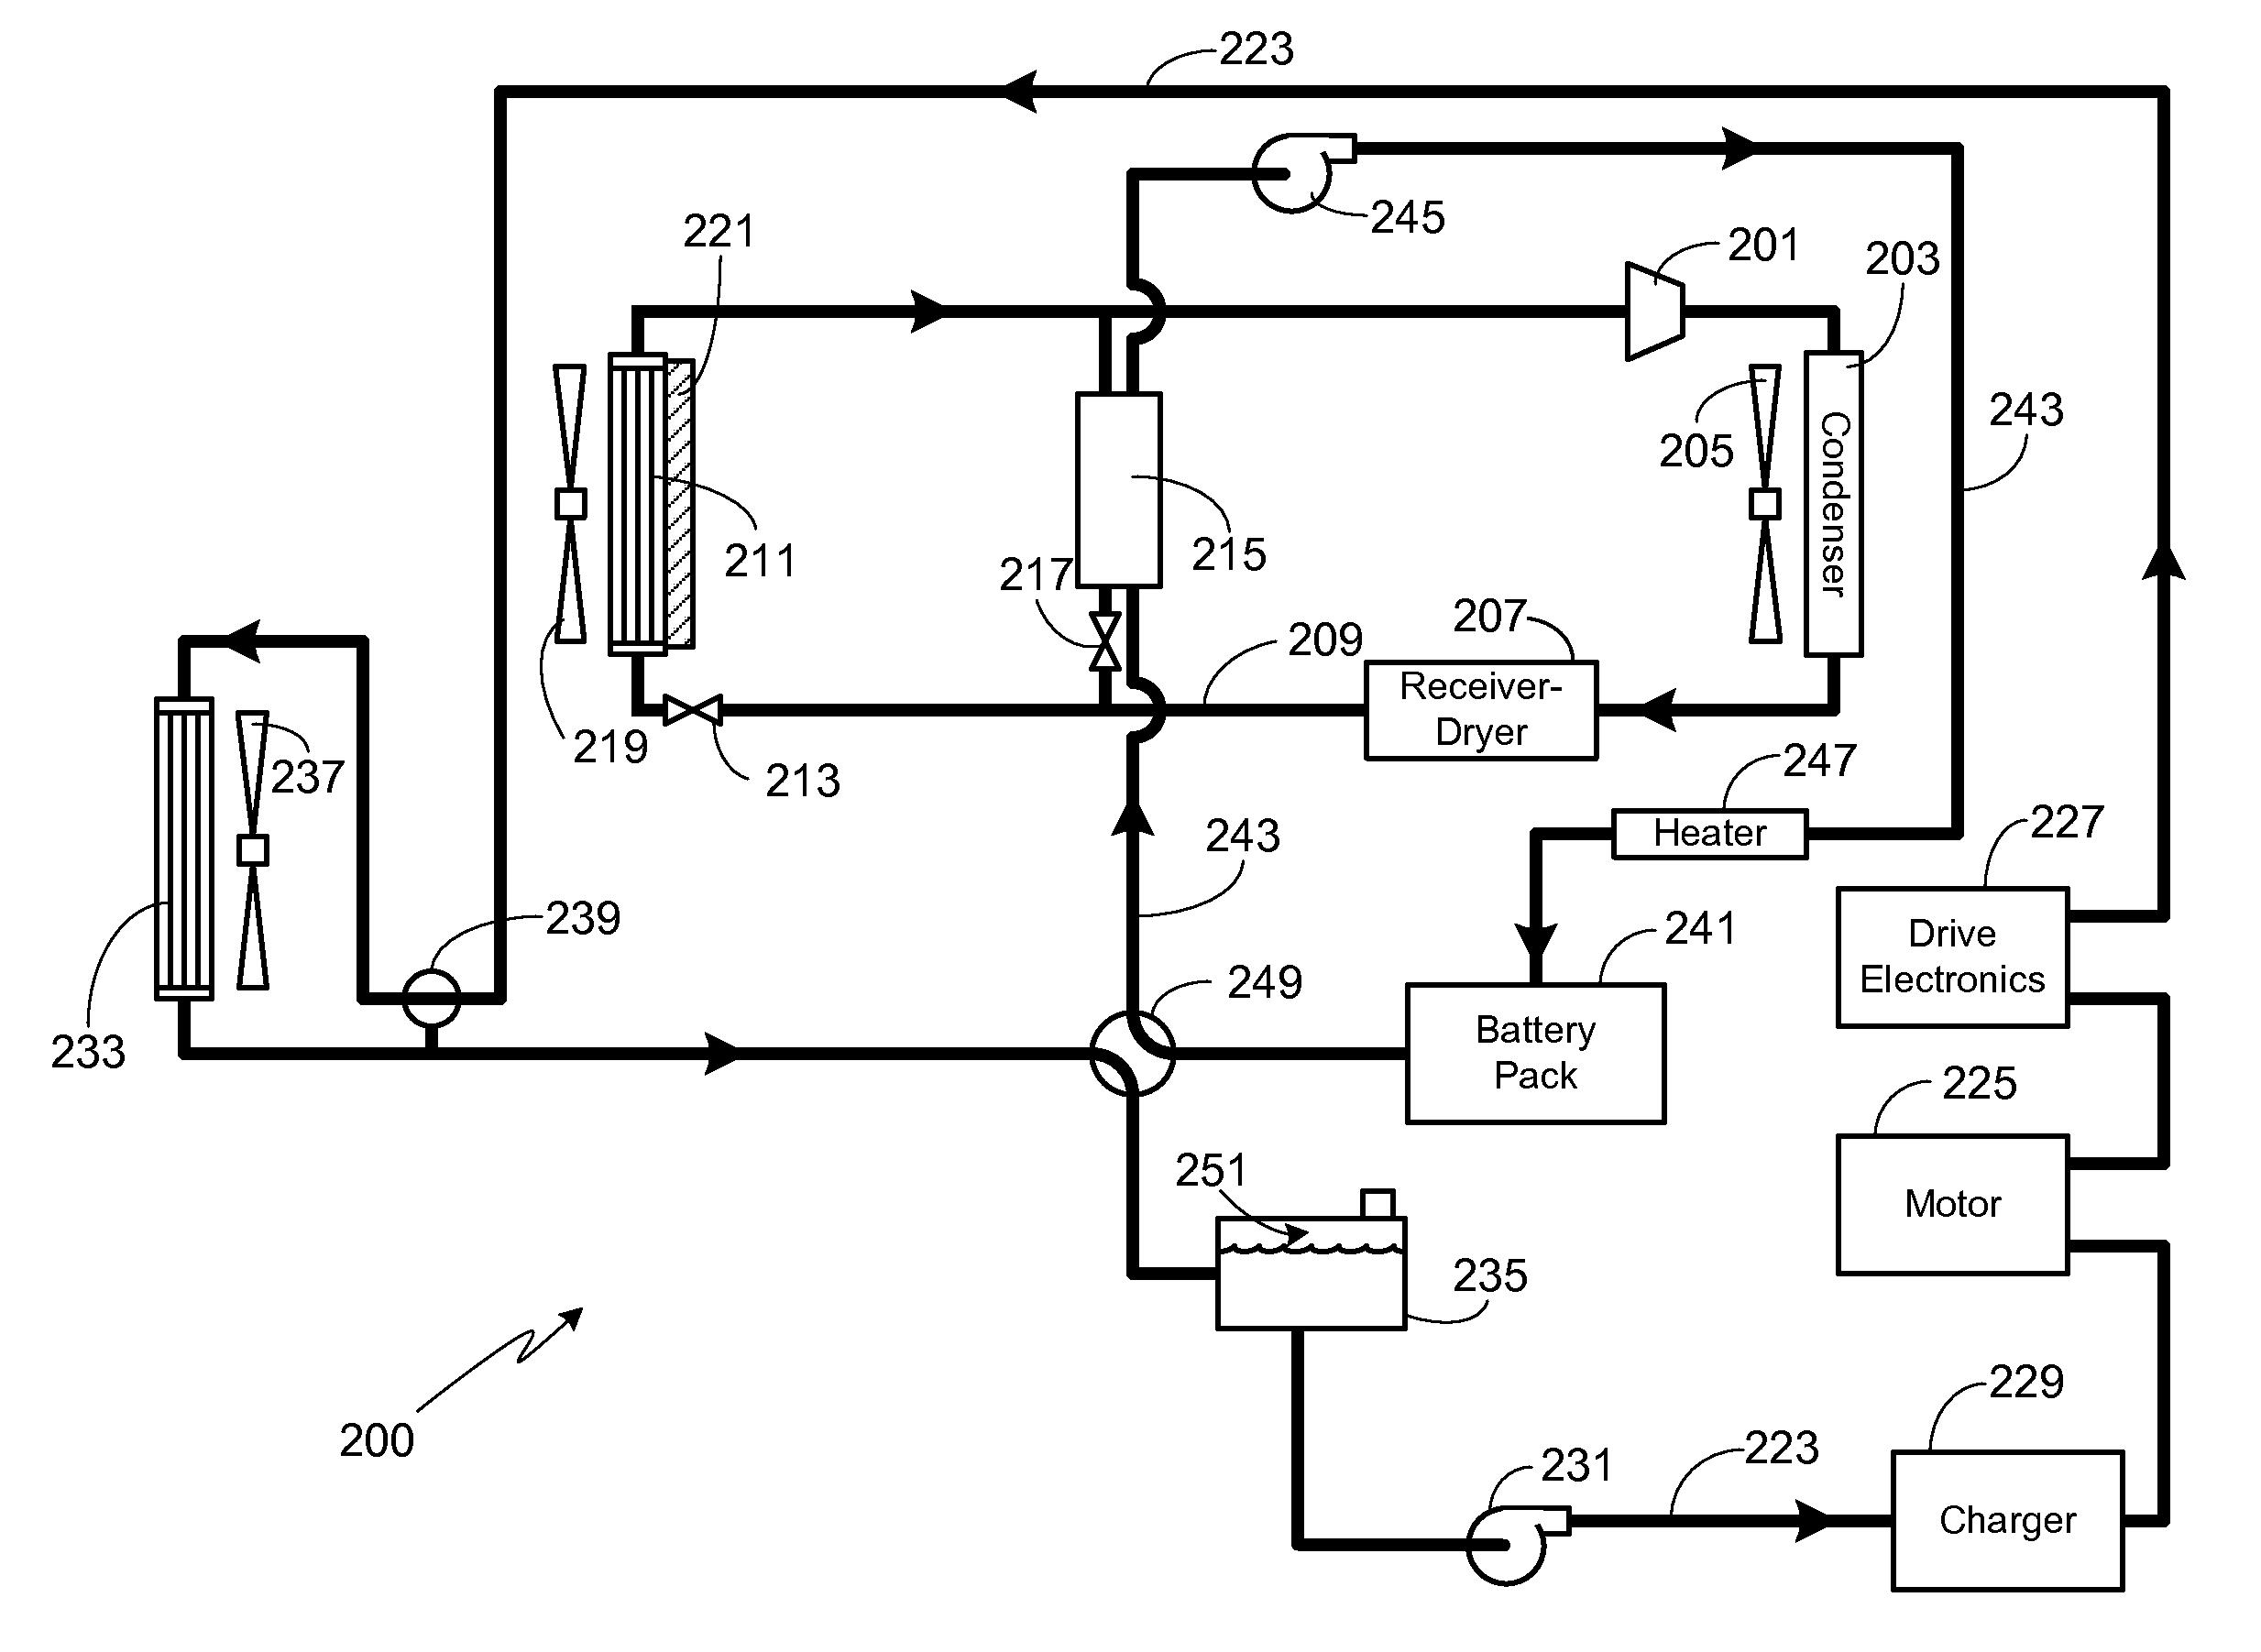 Pmac Vs Induction Motor For Model 3